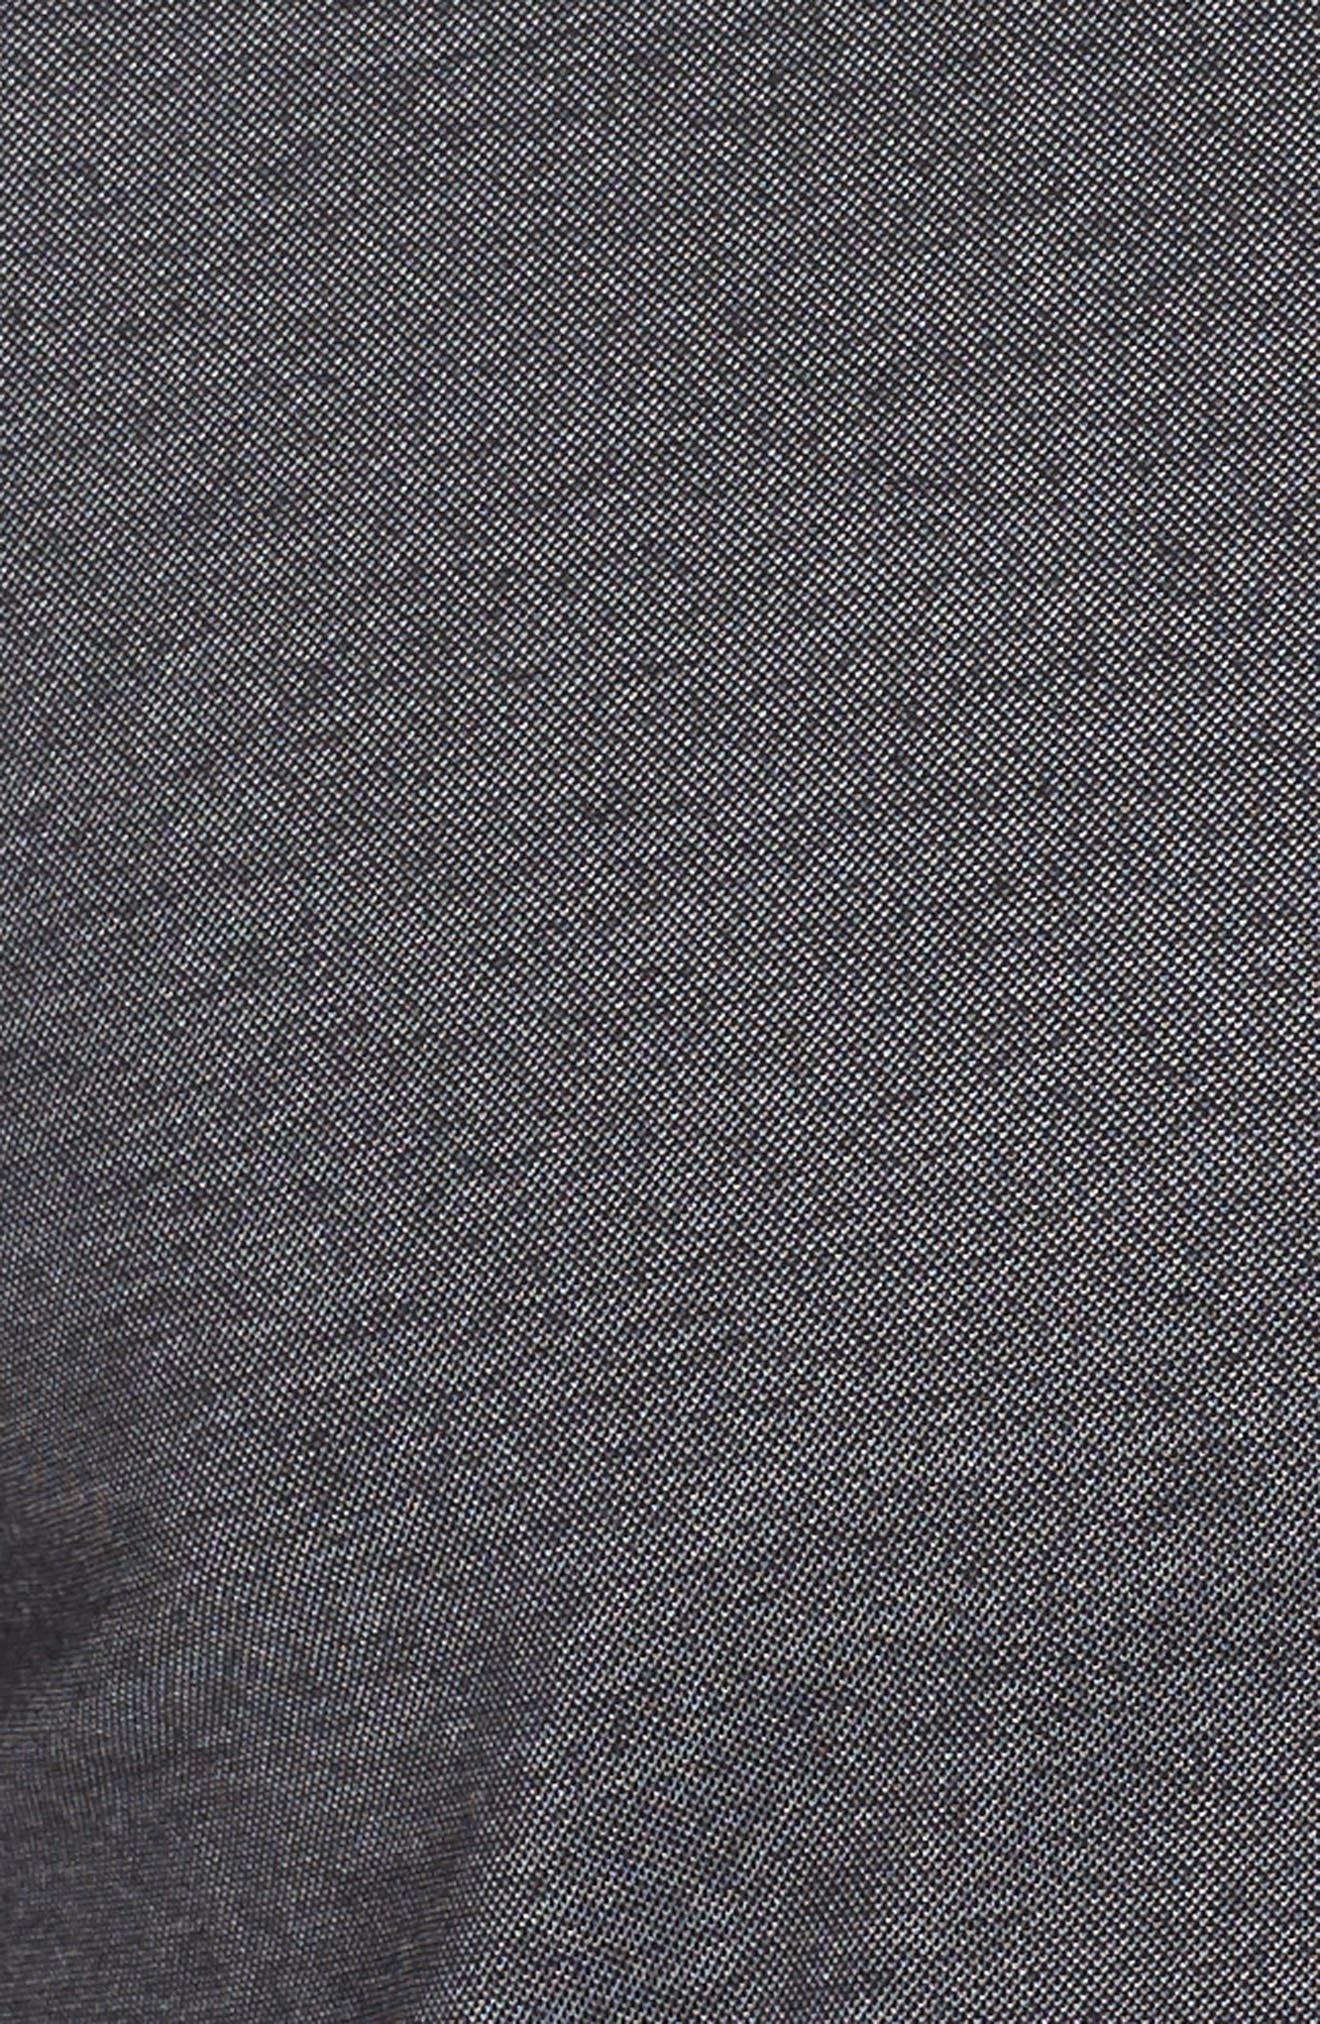 Trip'Slim Fit Wrinkle Free Sport Shirt,                             Alternate thumbnail 5, color,                             001